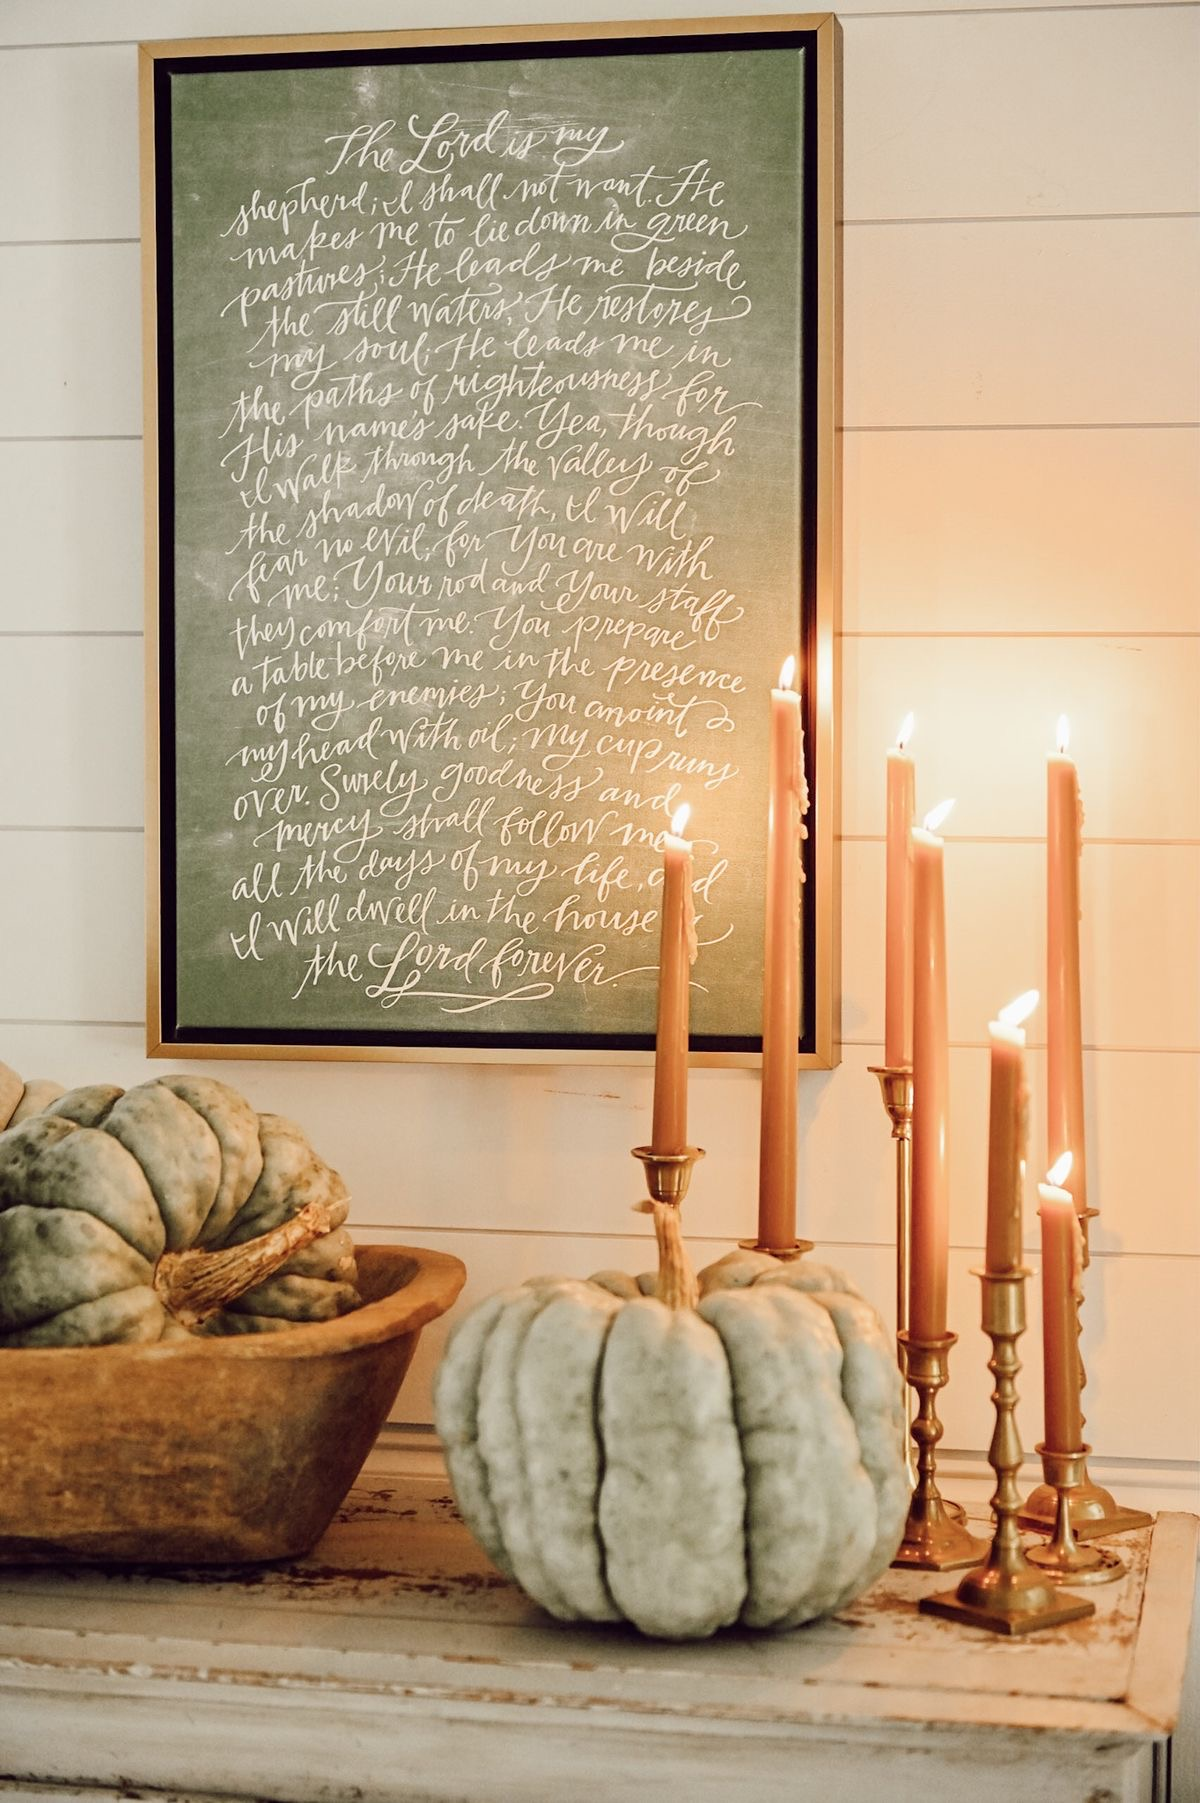 Kerzen - Interieur-Trends für den Oktober